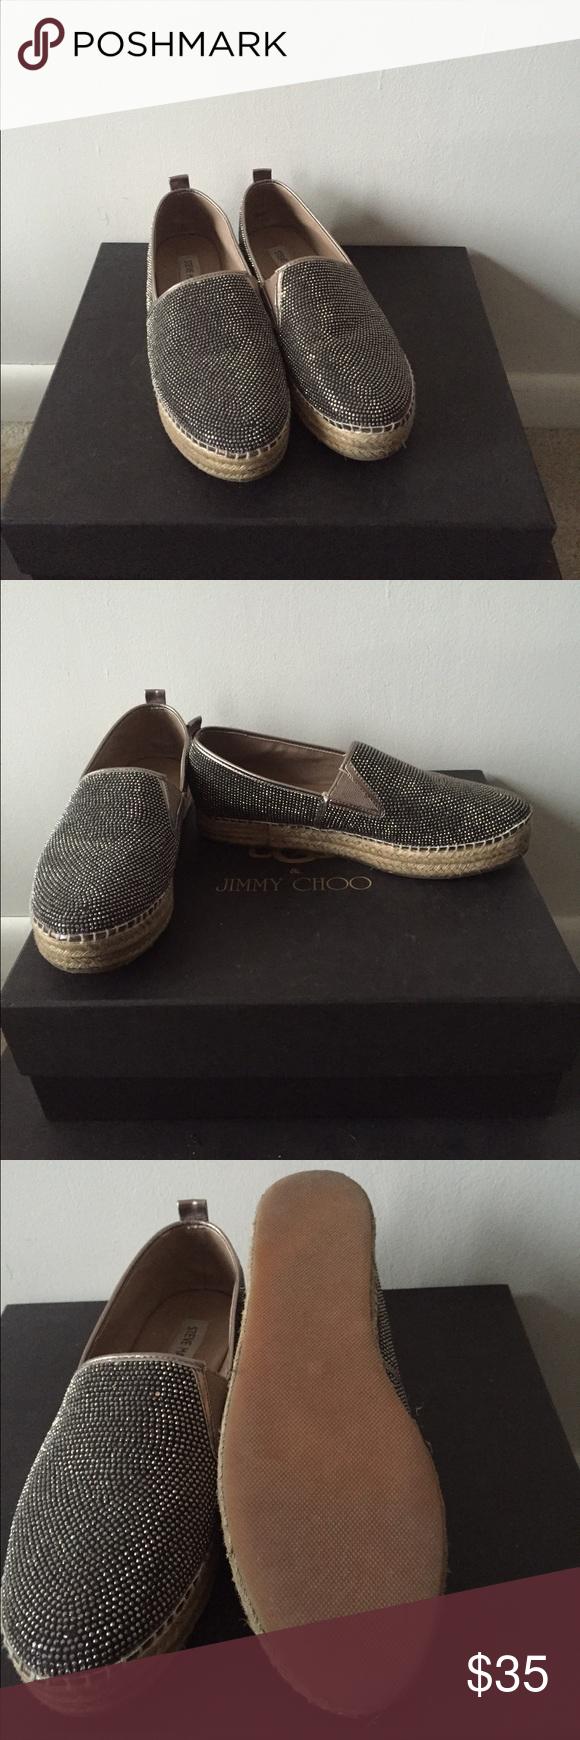 Steve Madden (Chopur R) Studded espadrilles Steve Madden Shoes Espadrilles